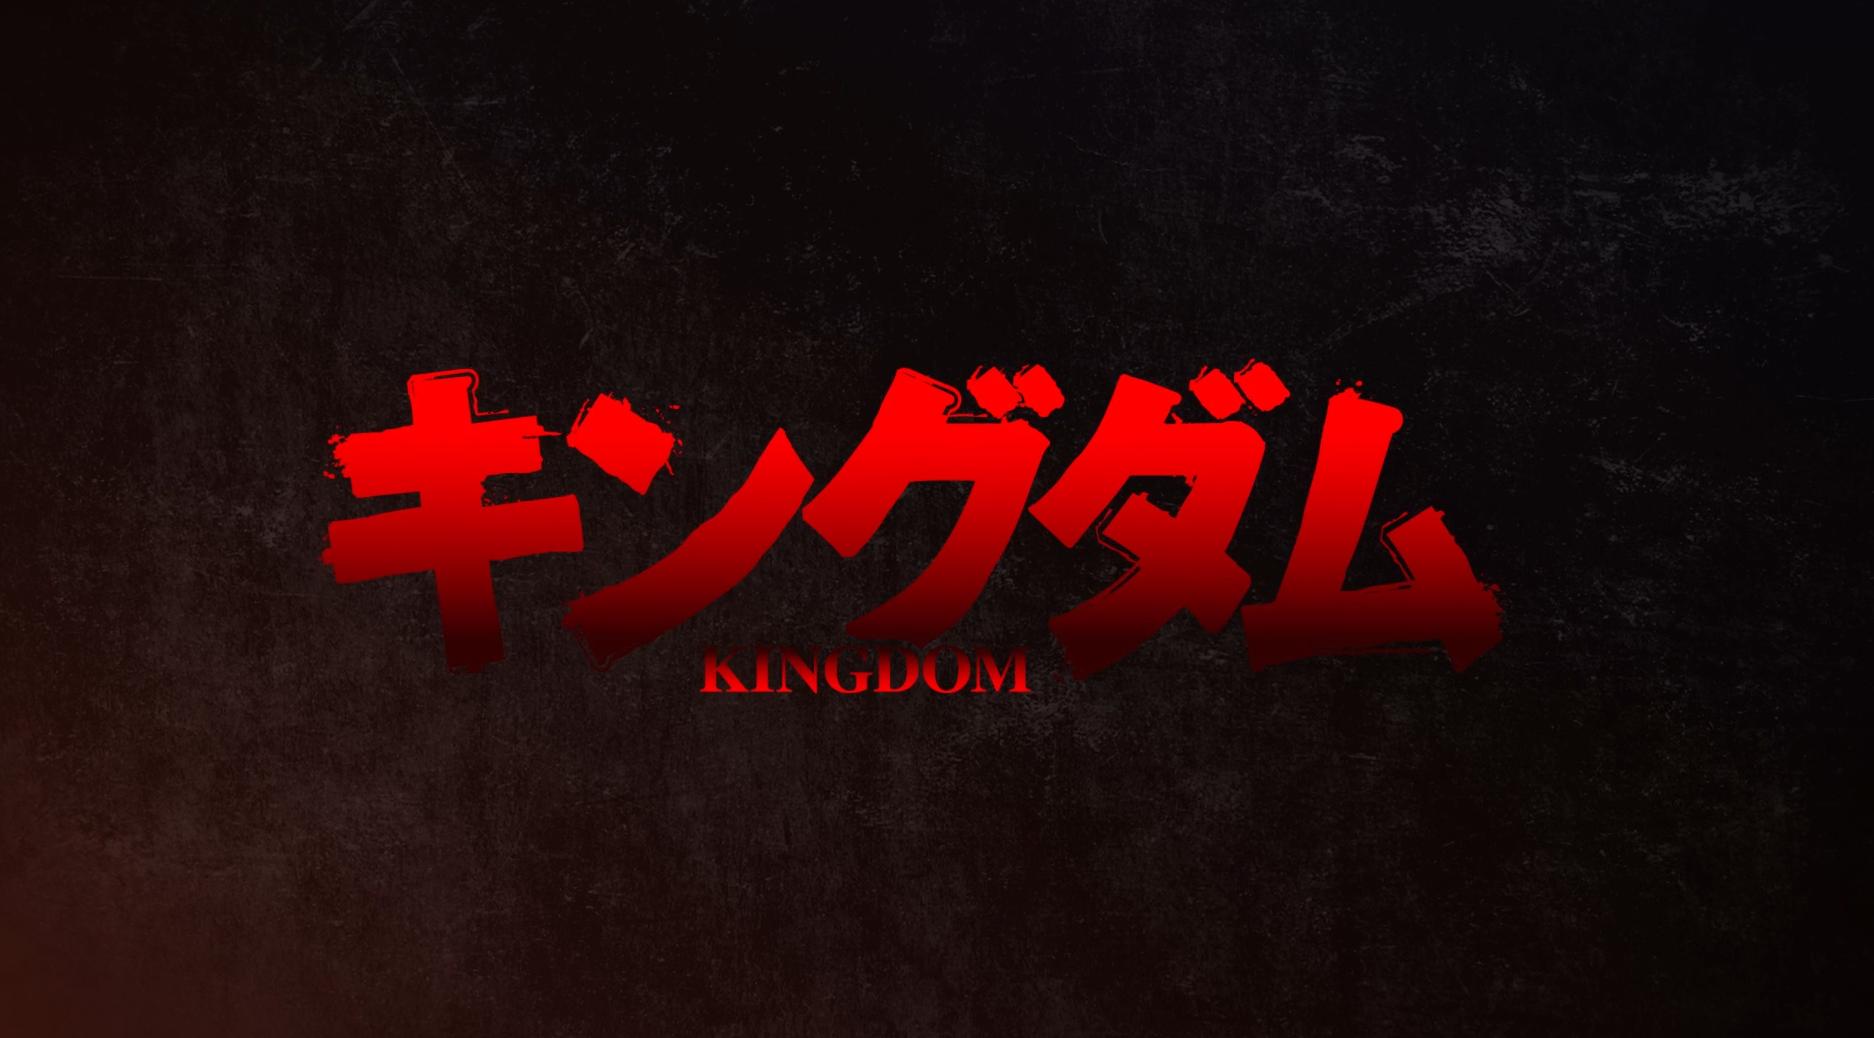 【AcFun独播】四月新番《王者天下 第三季》宣传PV